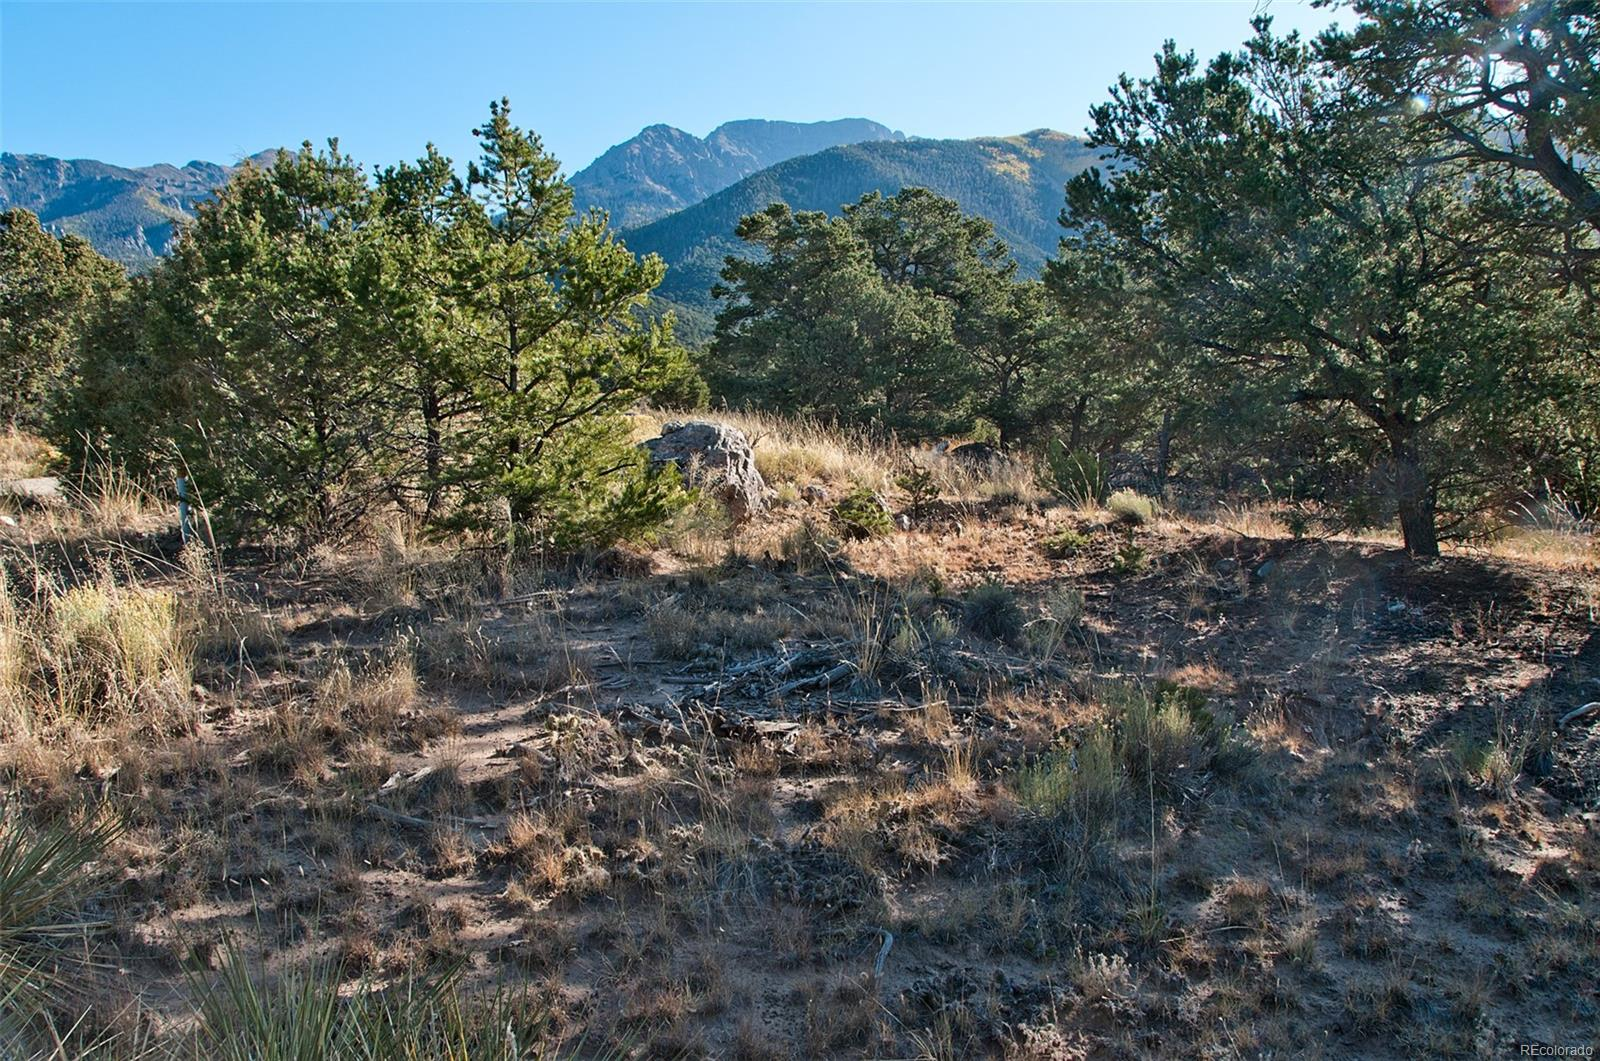 1788 Summitview Way, Crestone, CO 81131 - Crestone, CO real estate listing